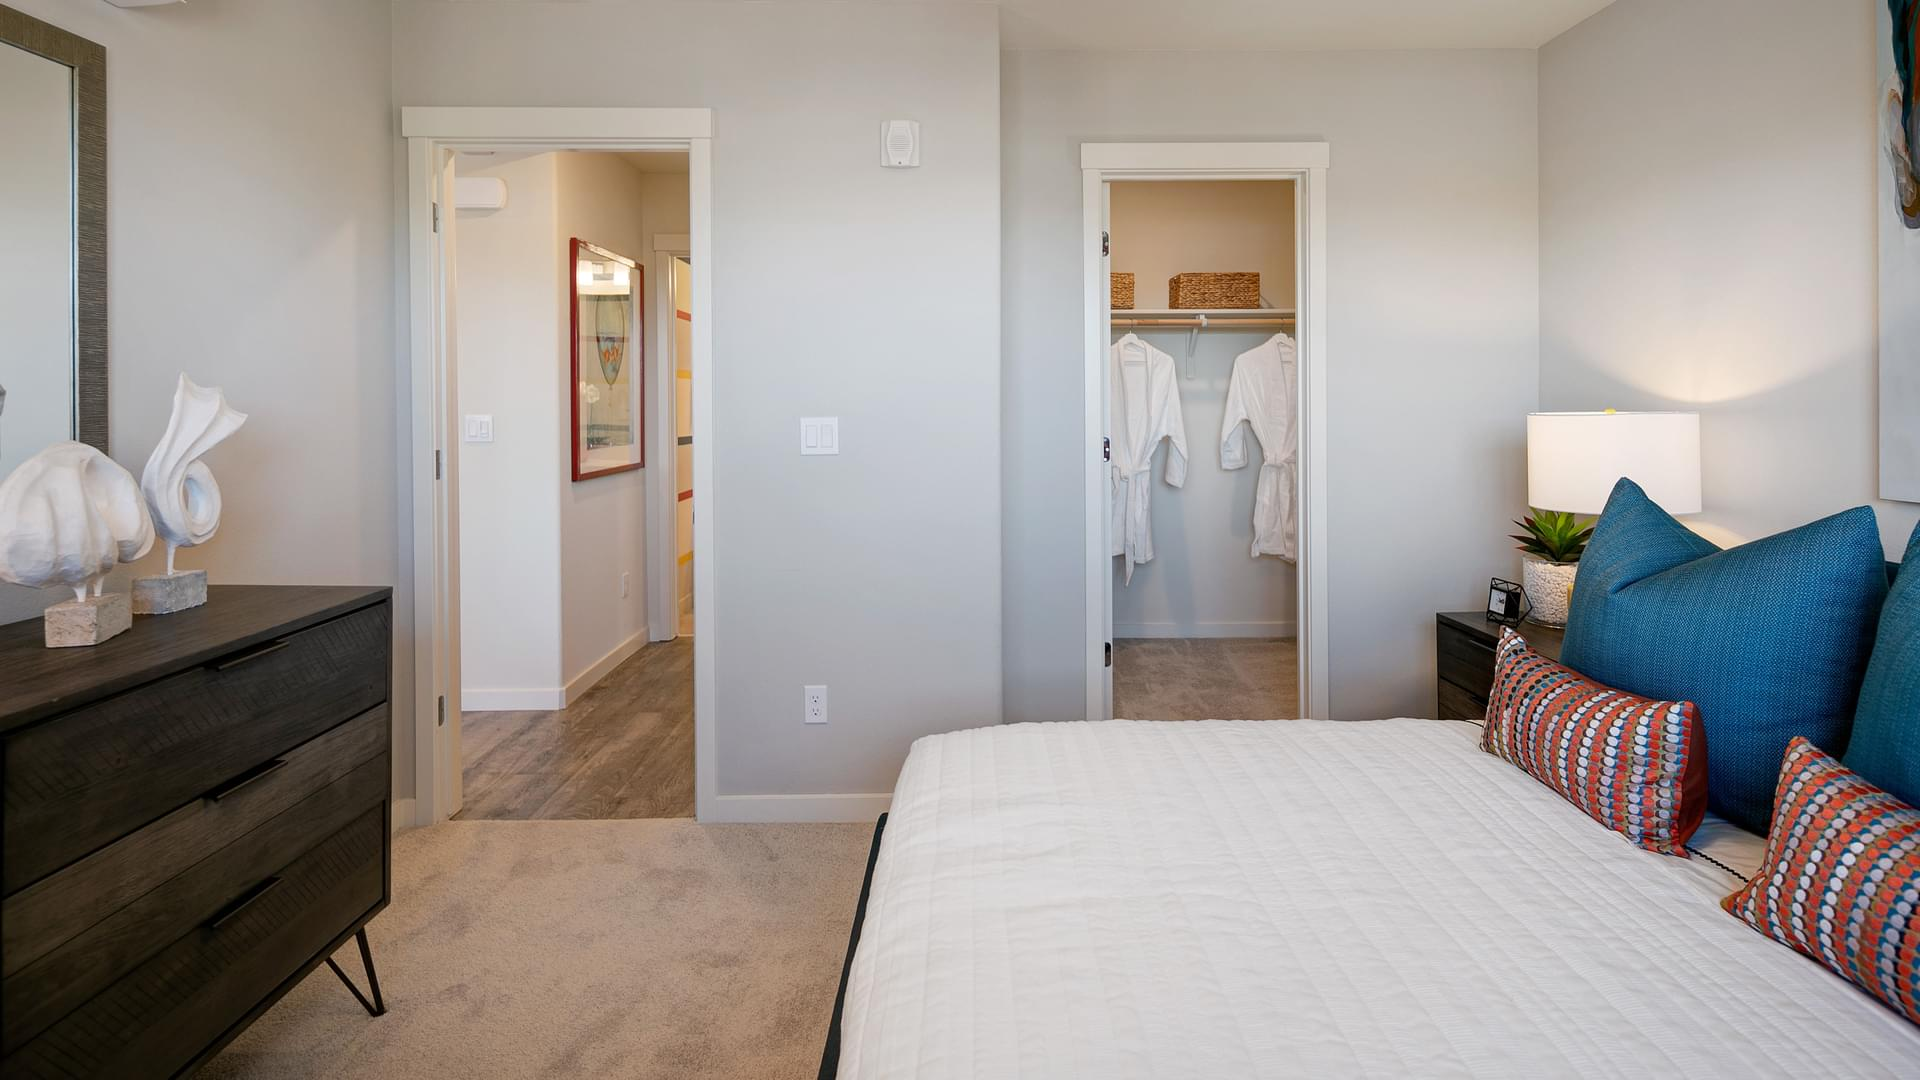 Residence 1 Bedroom